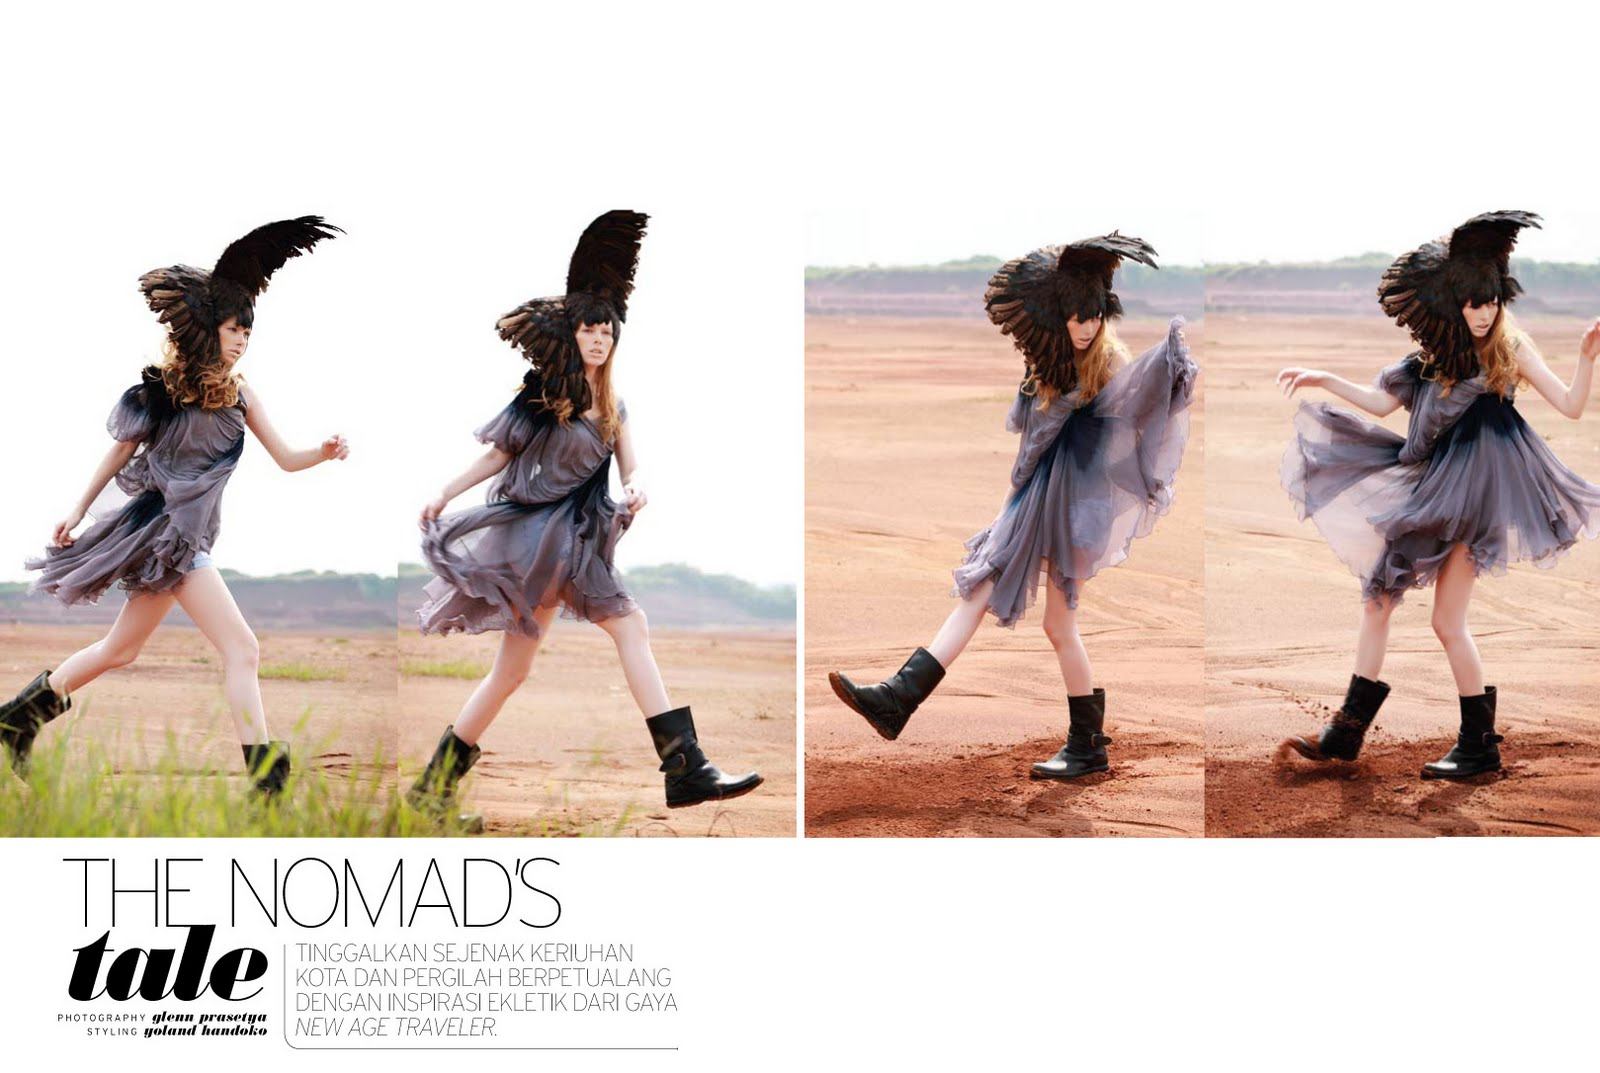 http://3.bp.blogspot.com/_Odu7eqW6gAY/THFookj54oI/AAAAAAAAkVc/gzS4IDrX1XE/s1600/Yoland+Handoko+%26+Glenn+Prasetya+for+ELLE+Indonesia+01.jpg